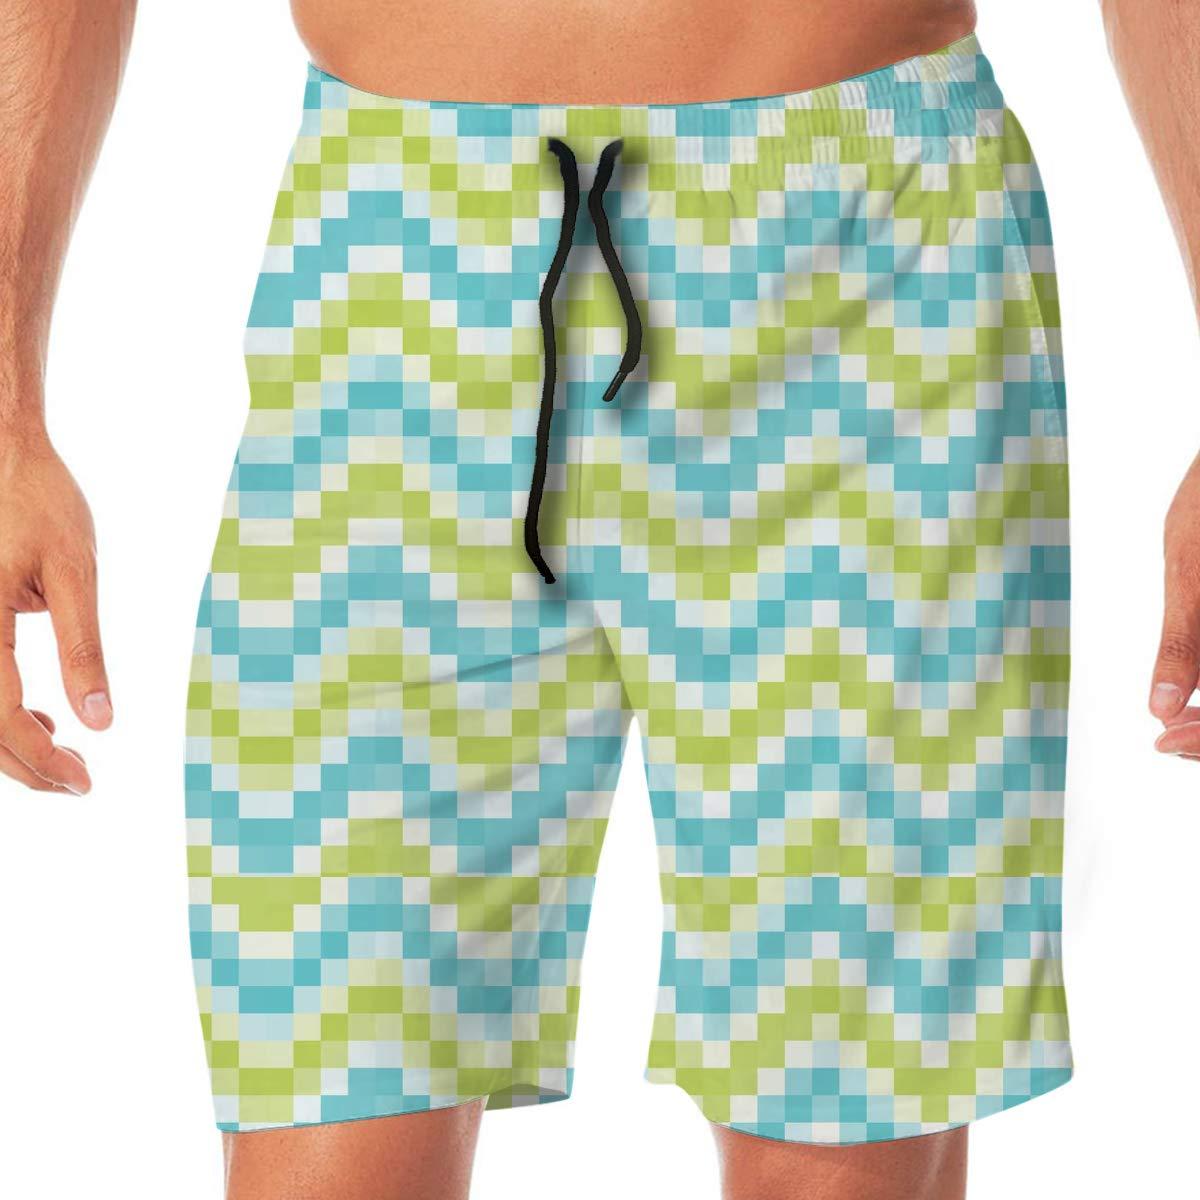 L XL Cbyan Mosaic Tiles Blue Green Background Beach Trunks Men Swimwear Shorts Swim Board Shorts with Mesh Lining M XXL